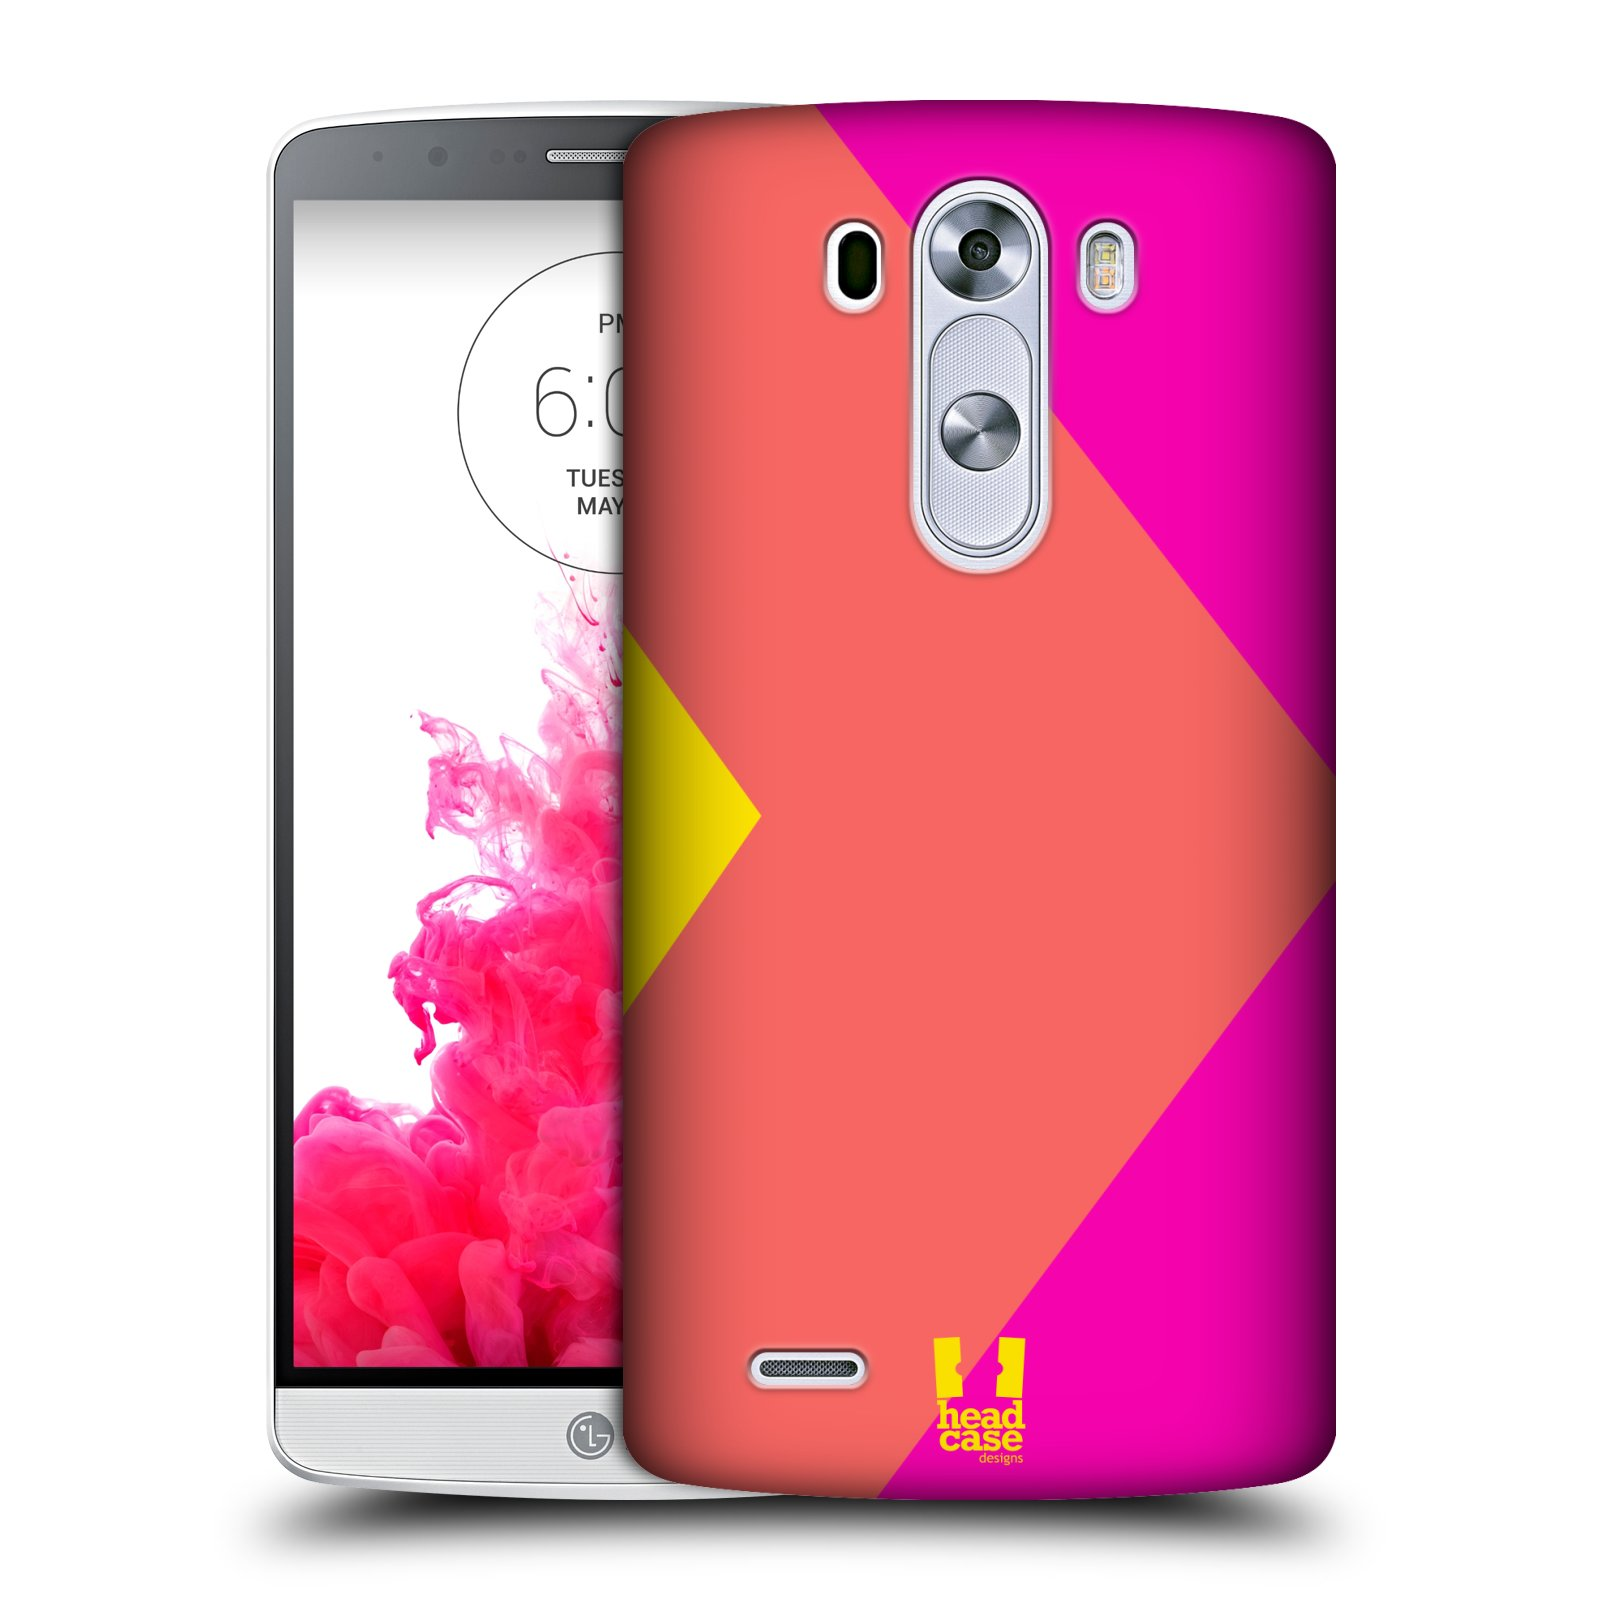 HEAD CASE DESIGNS COLOUR BLOCKING HARD BACK CASE FOR LG PHONES 1